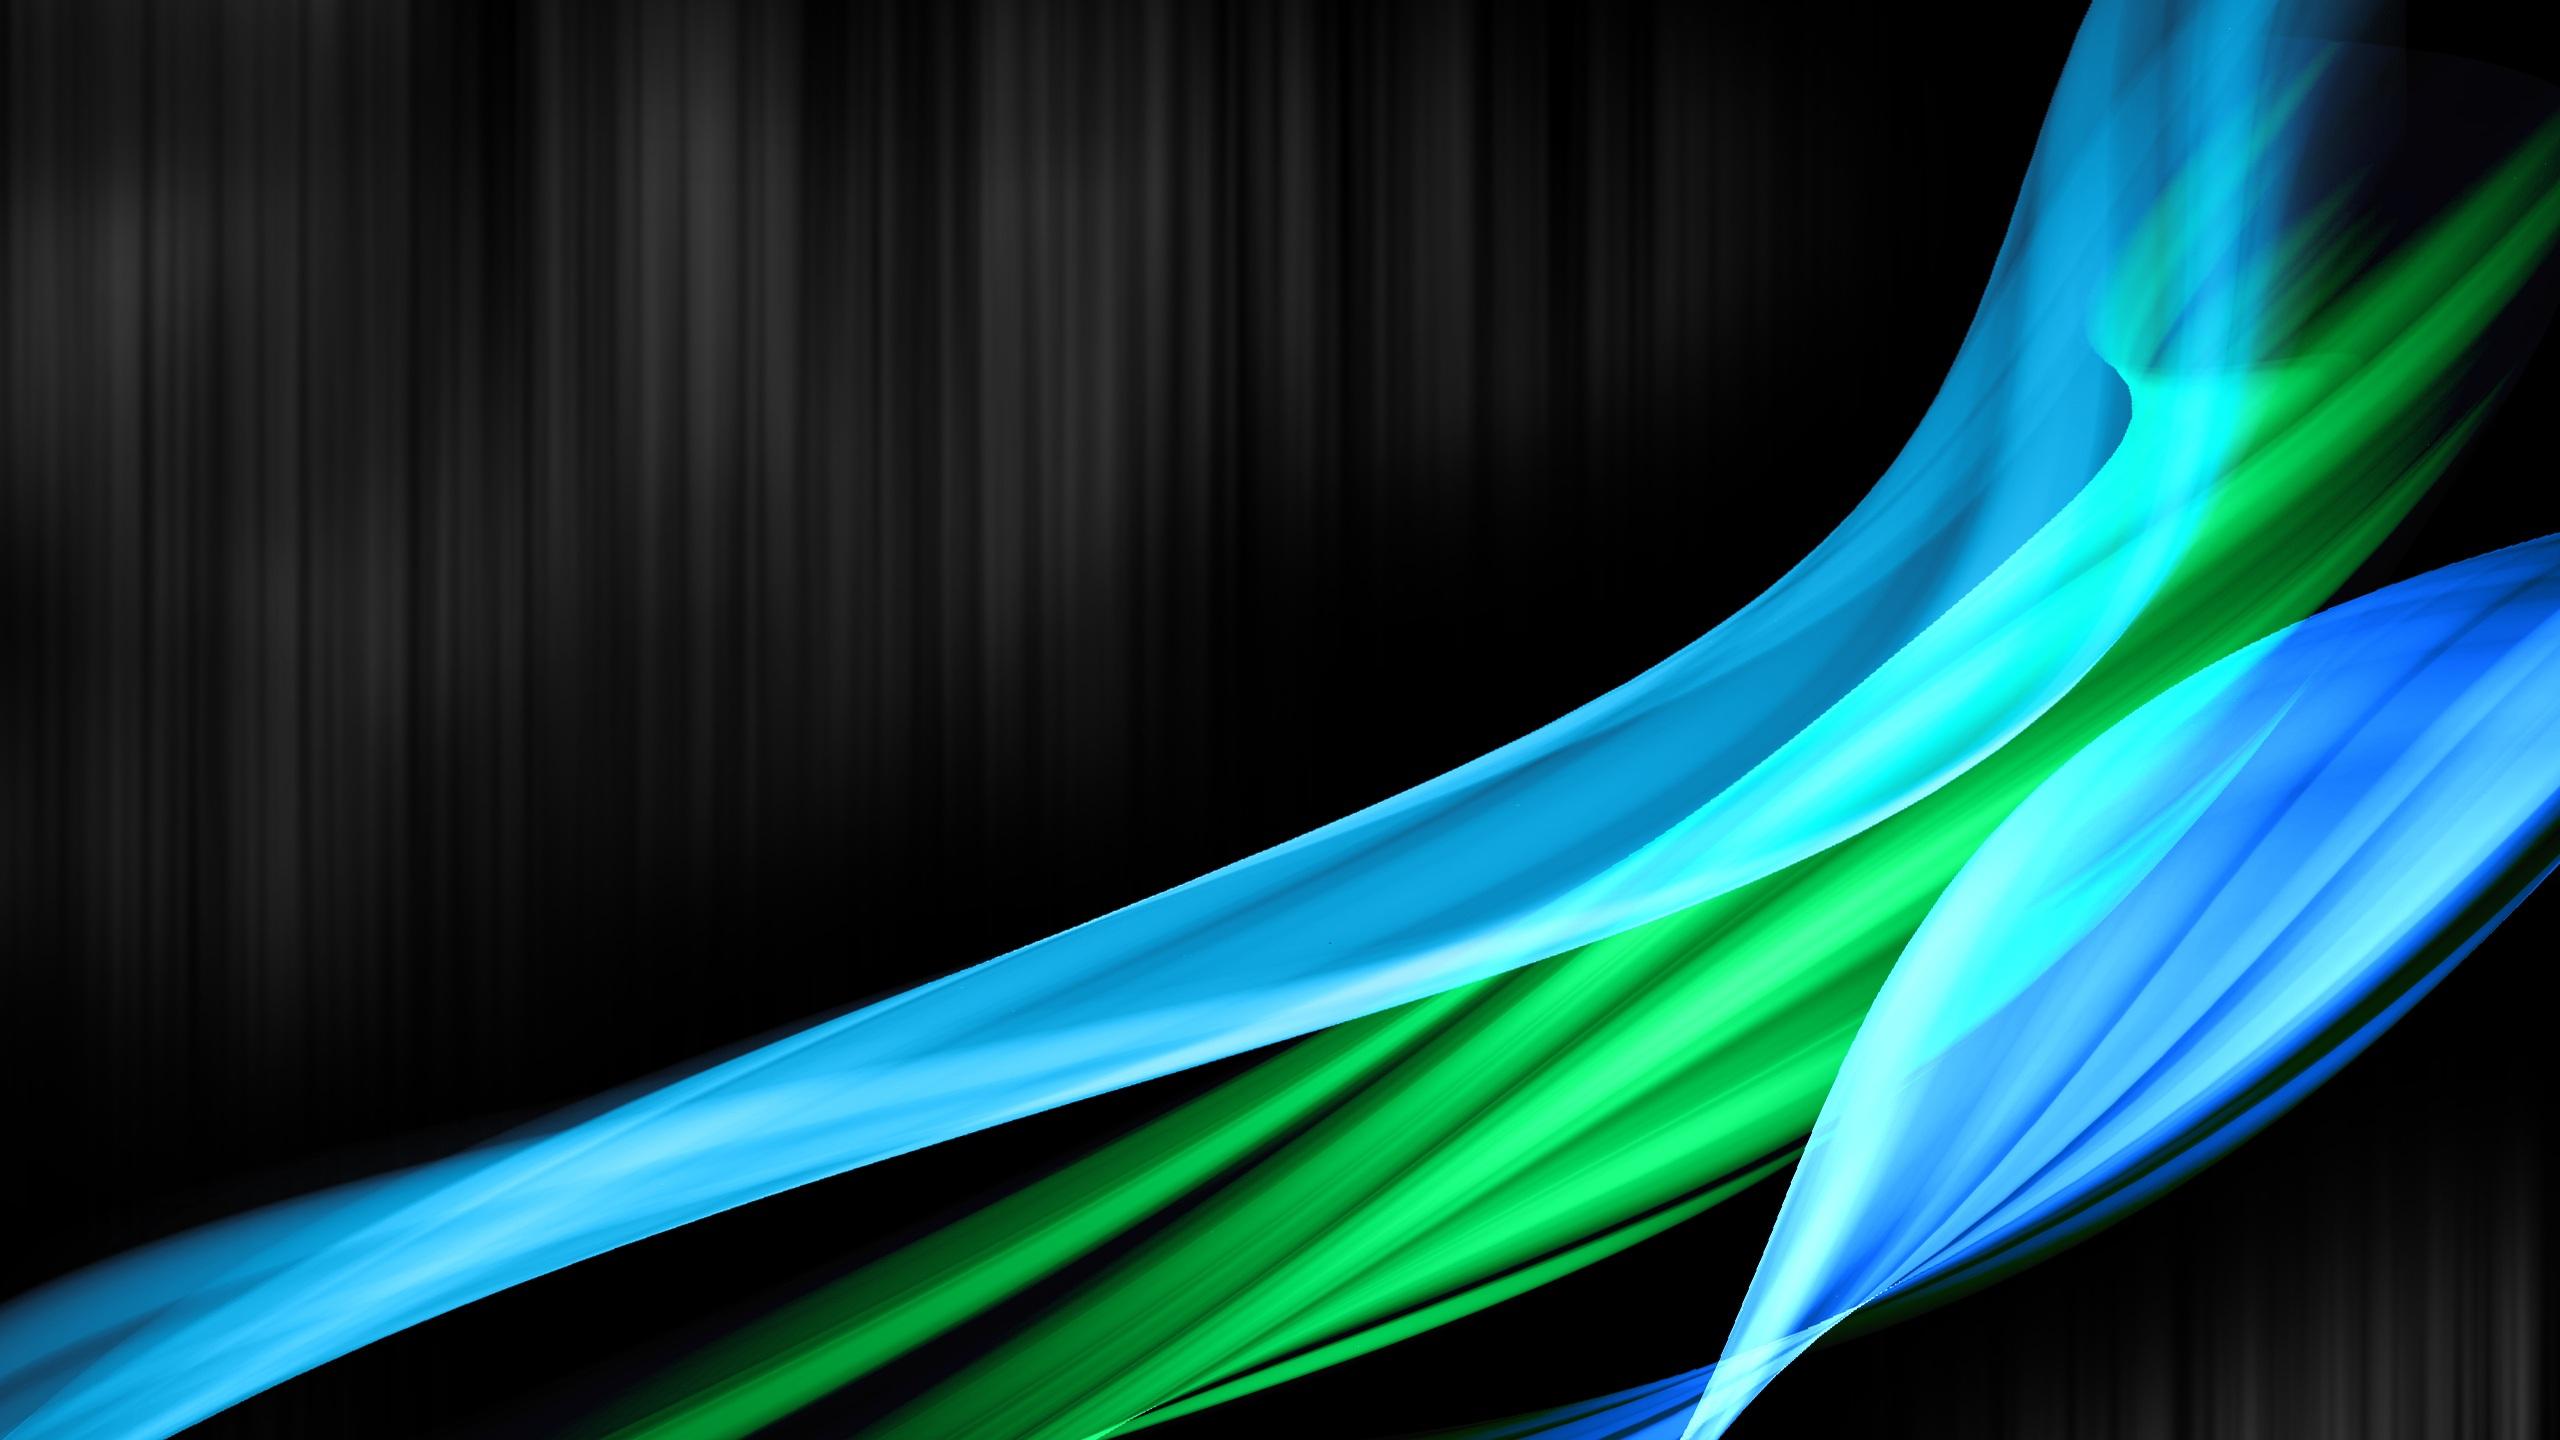 Fonds d 39 cran t l charger 2560x1440 bleu vert courbe for Fond ecran qhd